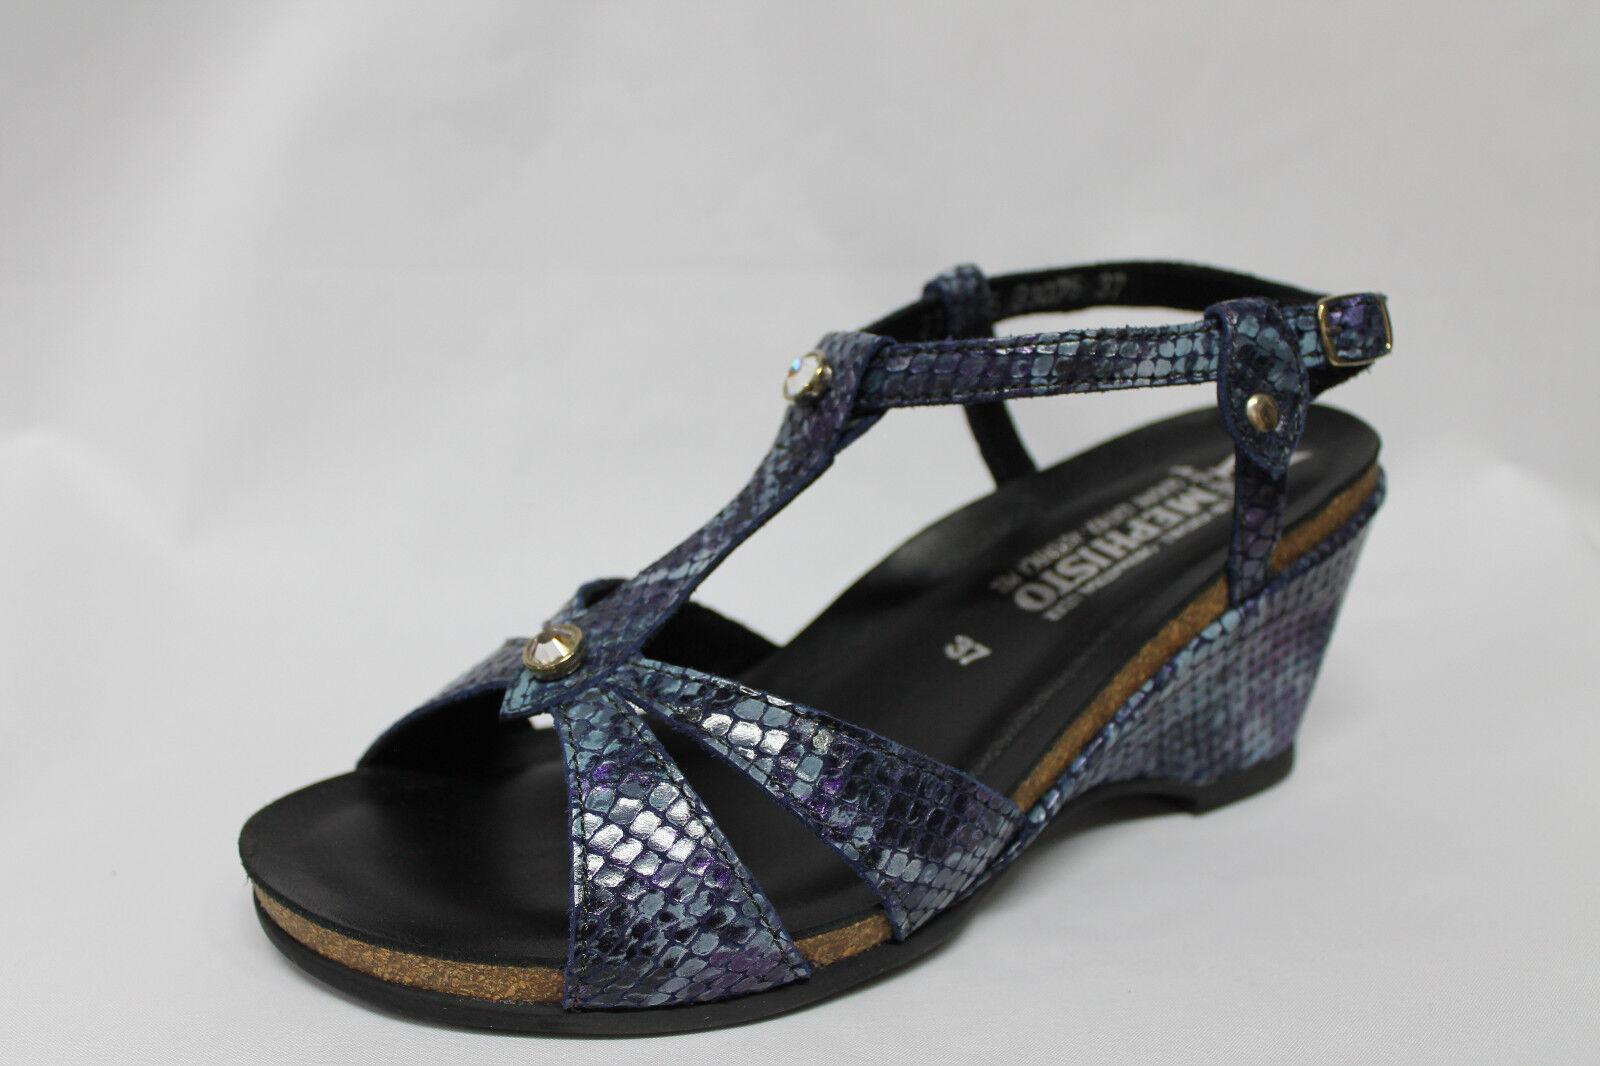 Sandals Mephisto NICASIA Leather Snakeskin Wedge 7 cm list  139 - 30%